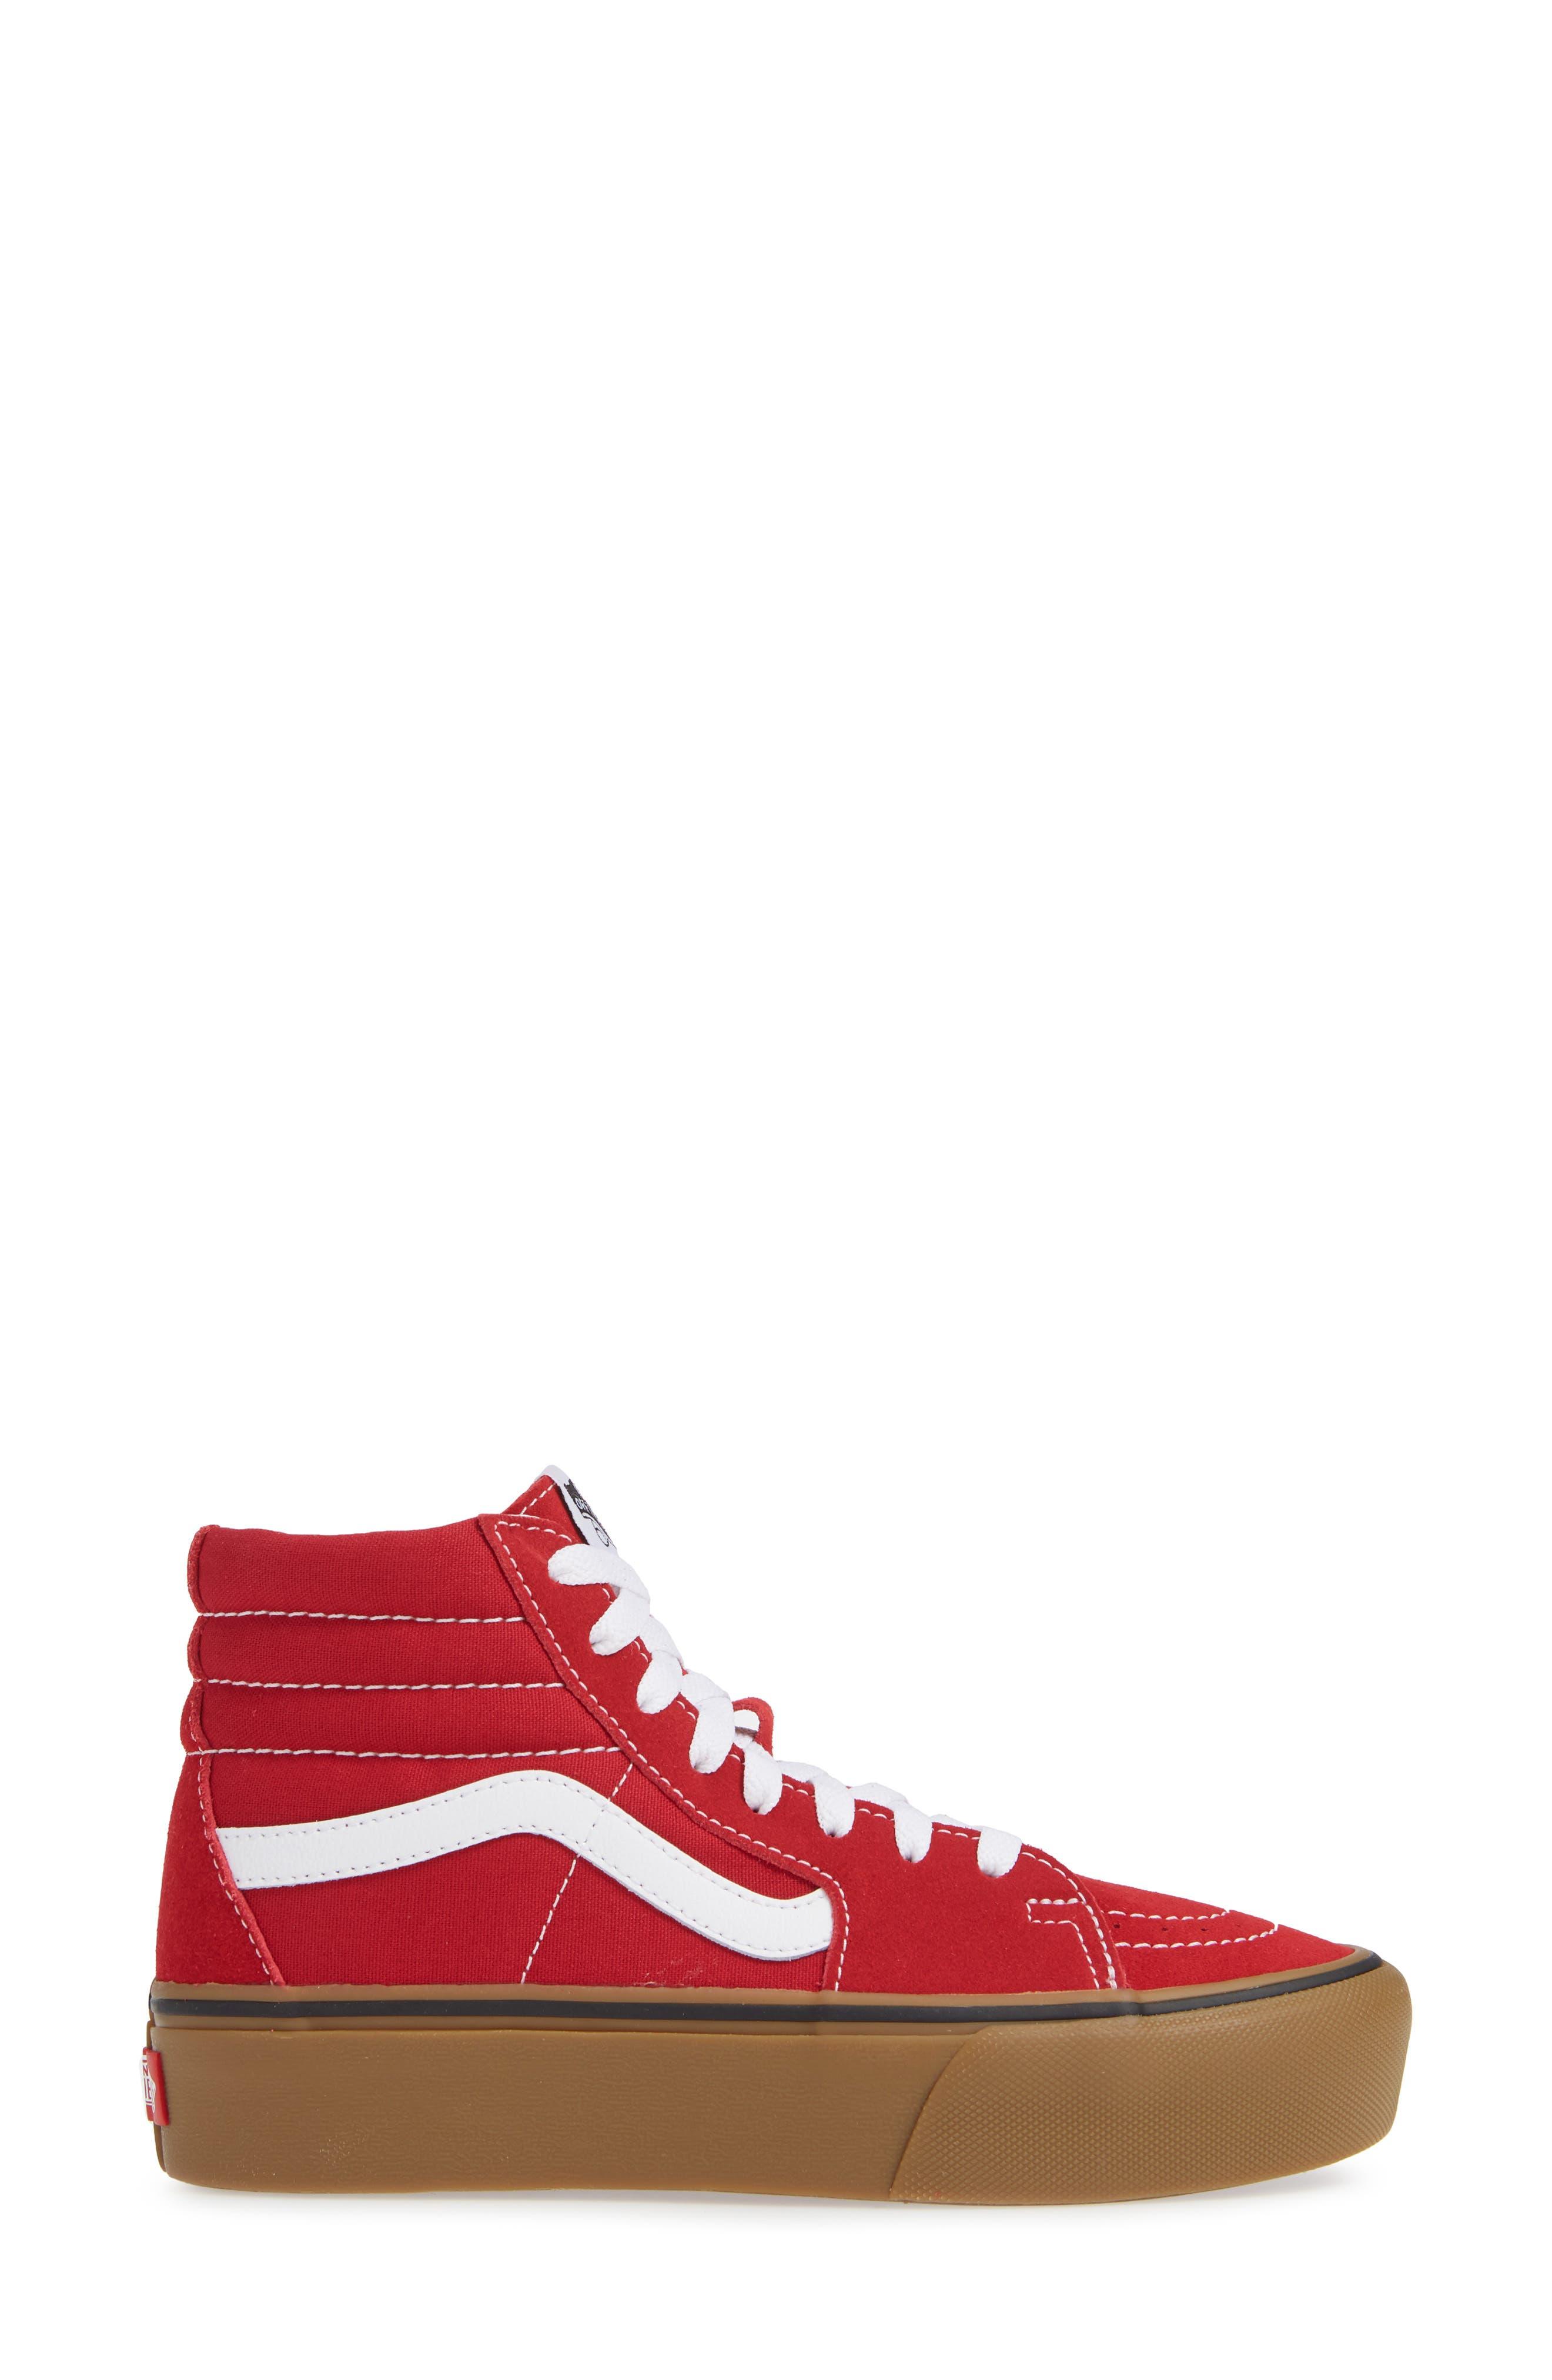 Sk8-Hi Platform Sneaker,                             Alternate thumbnail 3, color,                             SCOOTER/ TRUE WHITE